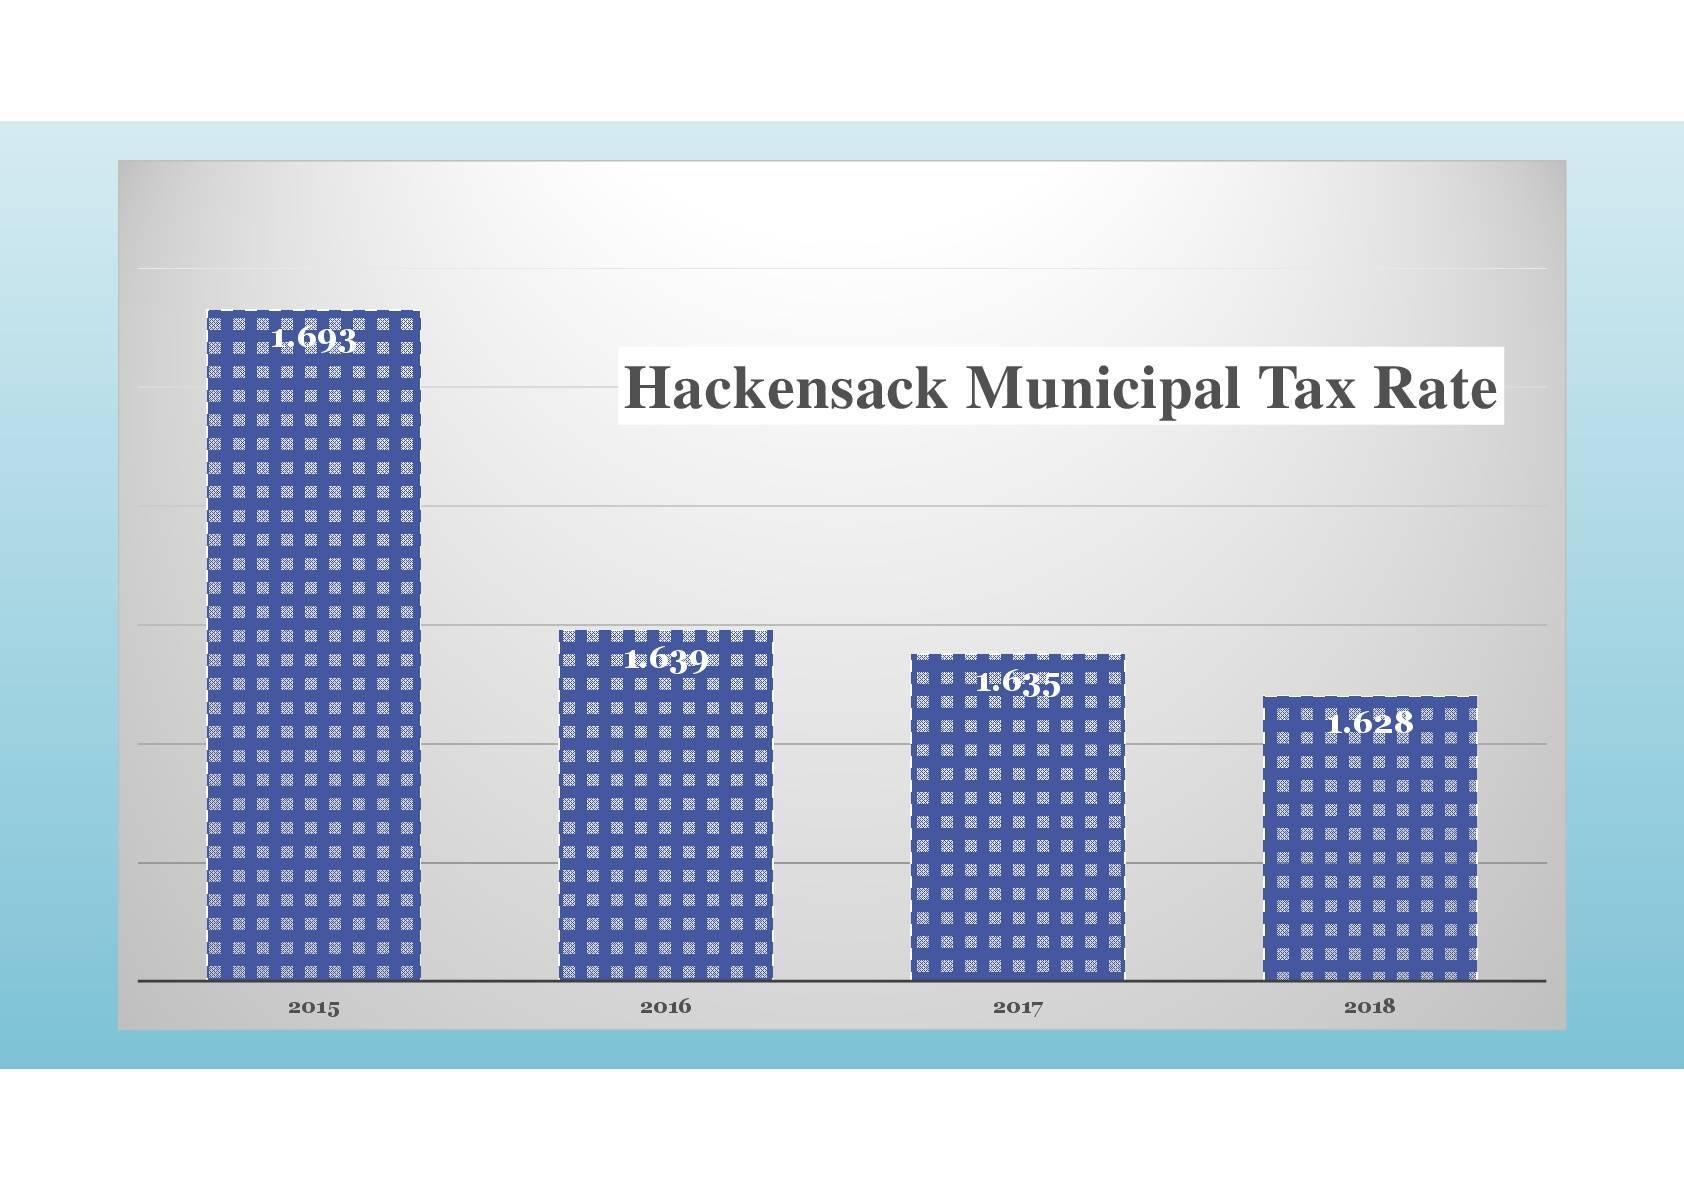 865b3f8ca90f5509c2e6_2018_Municipal_Budget_Presentation-16-16.jpg-001.jpg